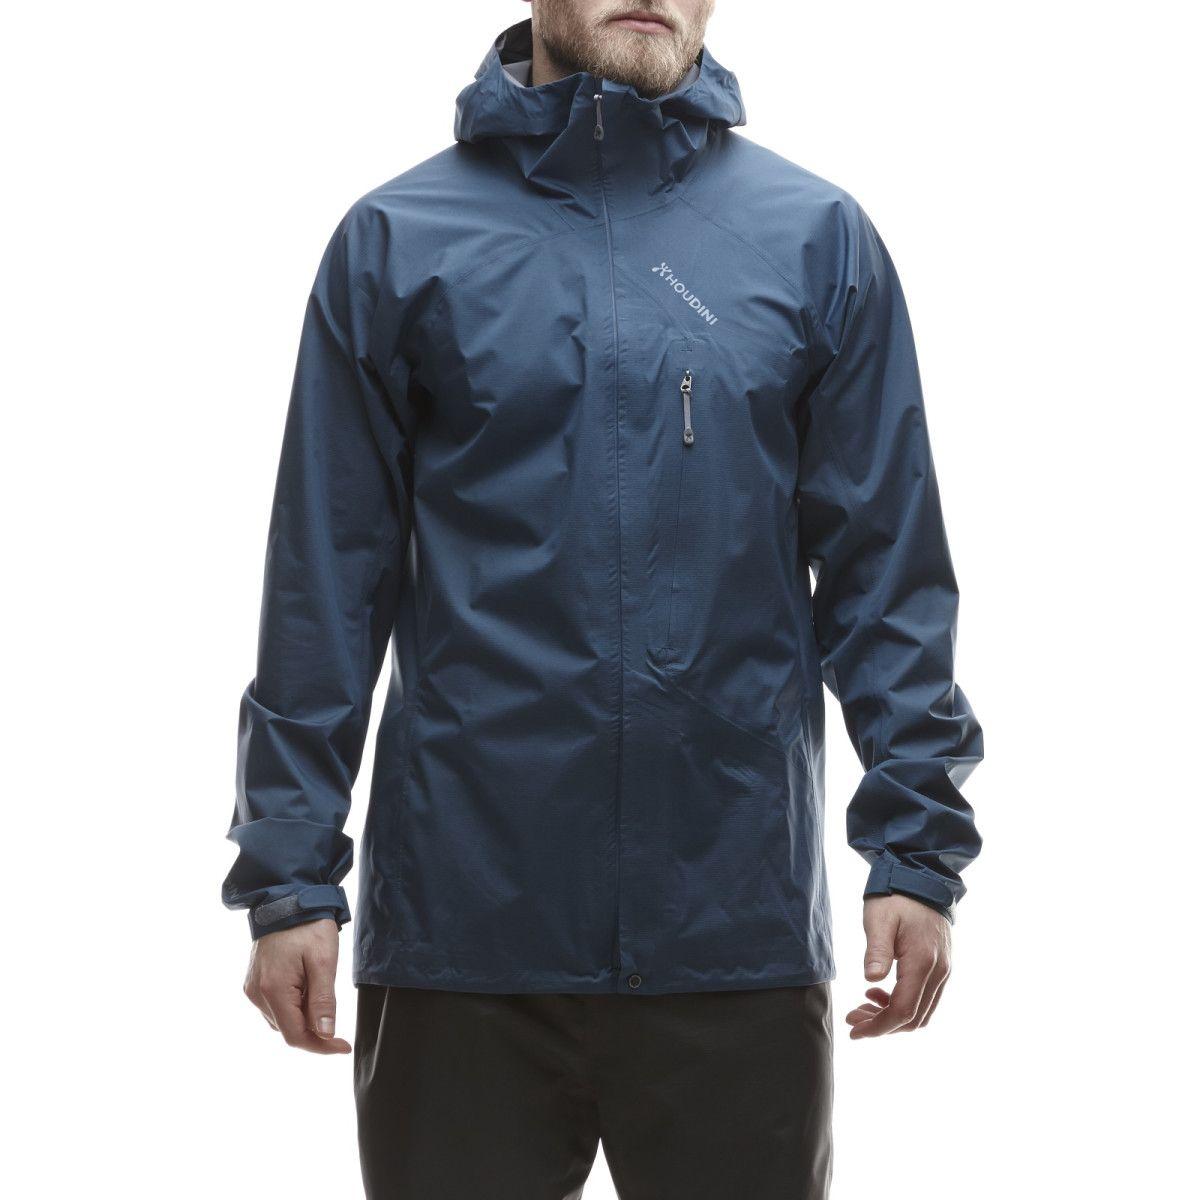 11462b10 Køb Houdini Men's 4Ace Jacket fra Outnorth | suckless shell jackets ...